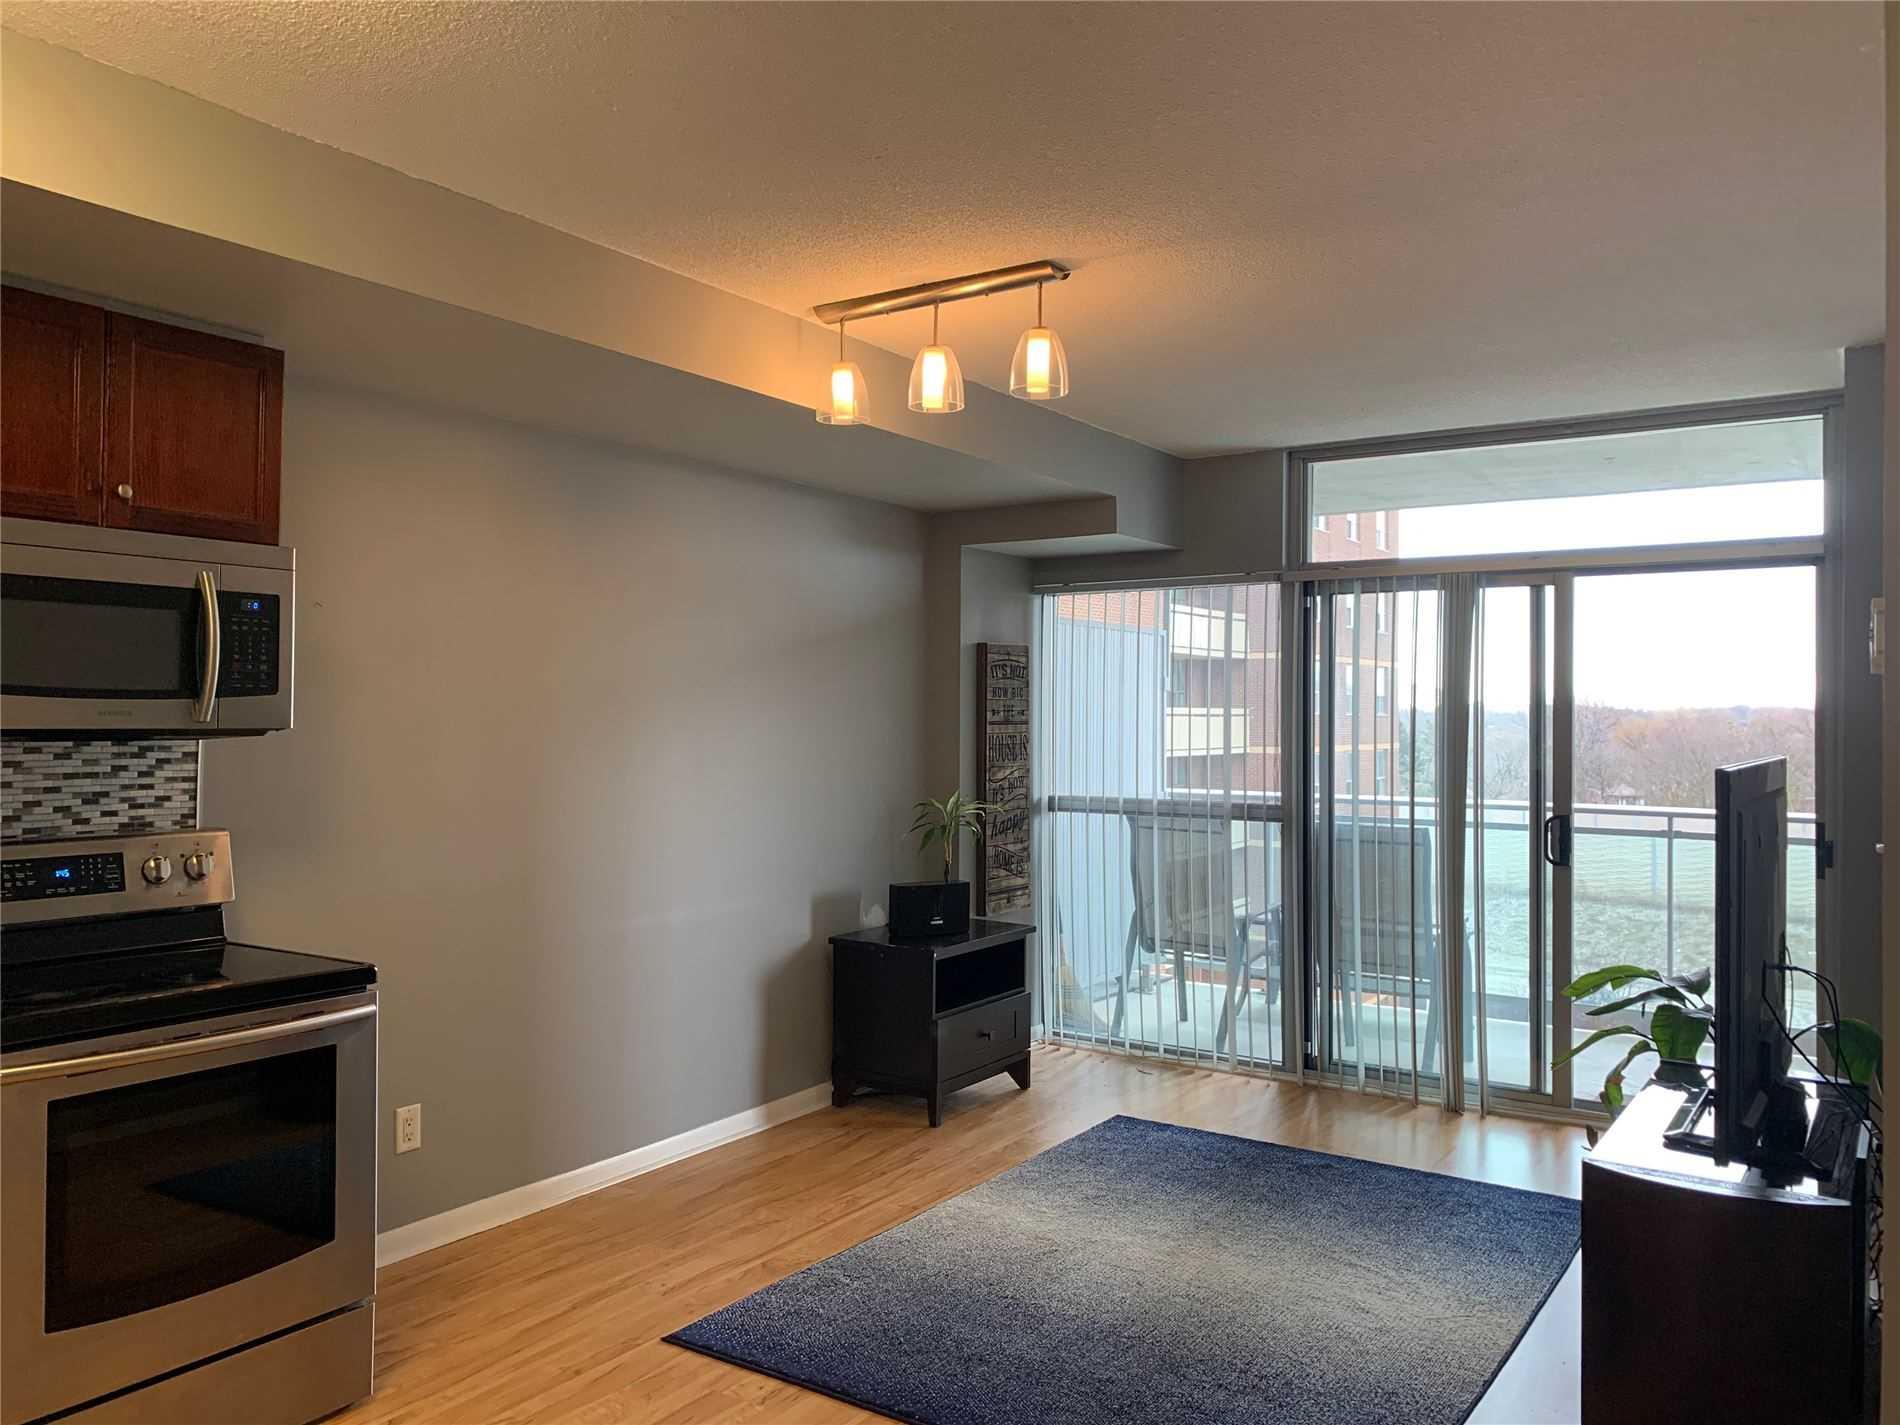 #706 - 2464 Weston Rd, Toronto